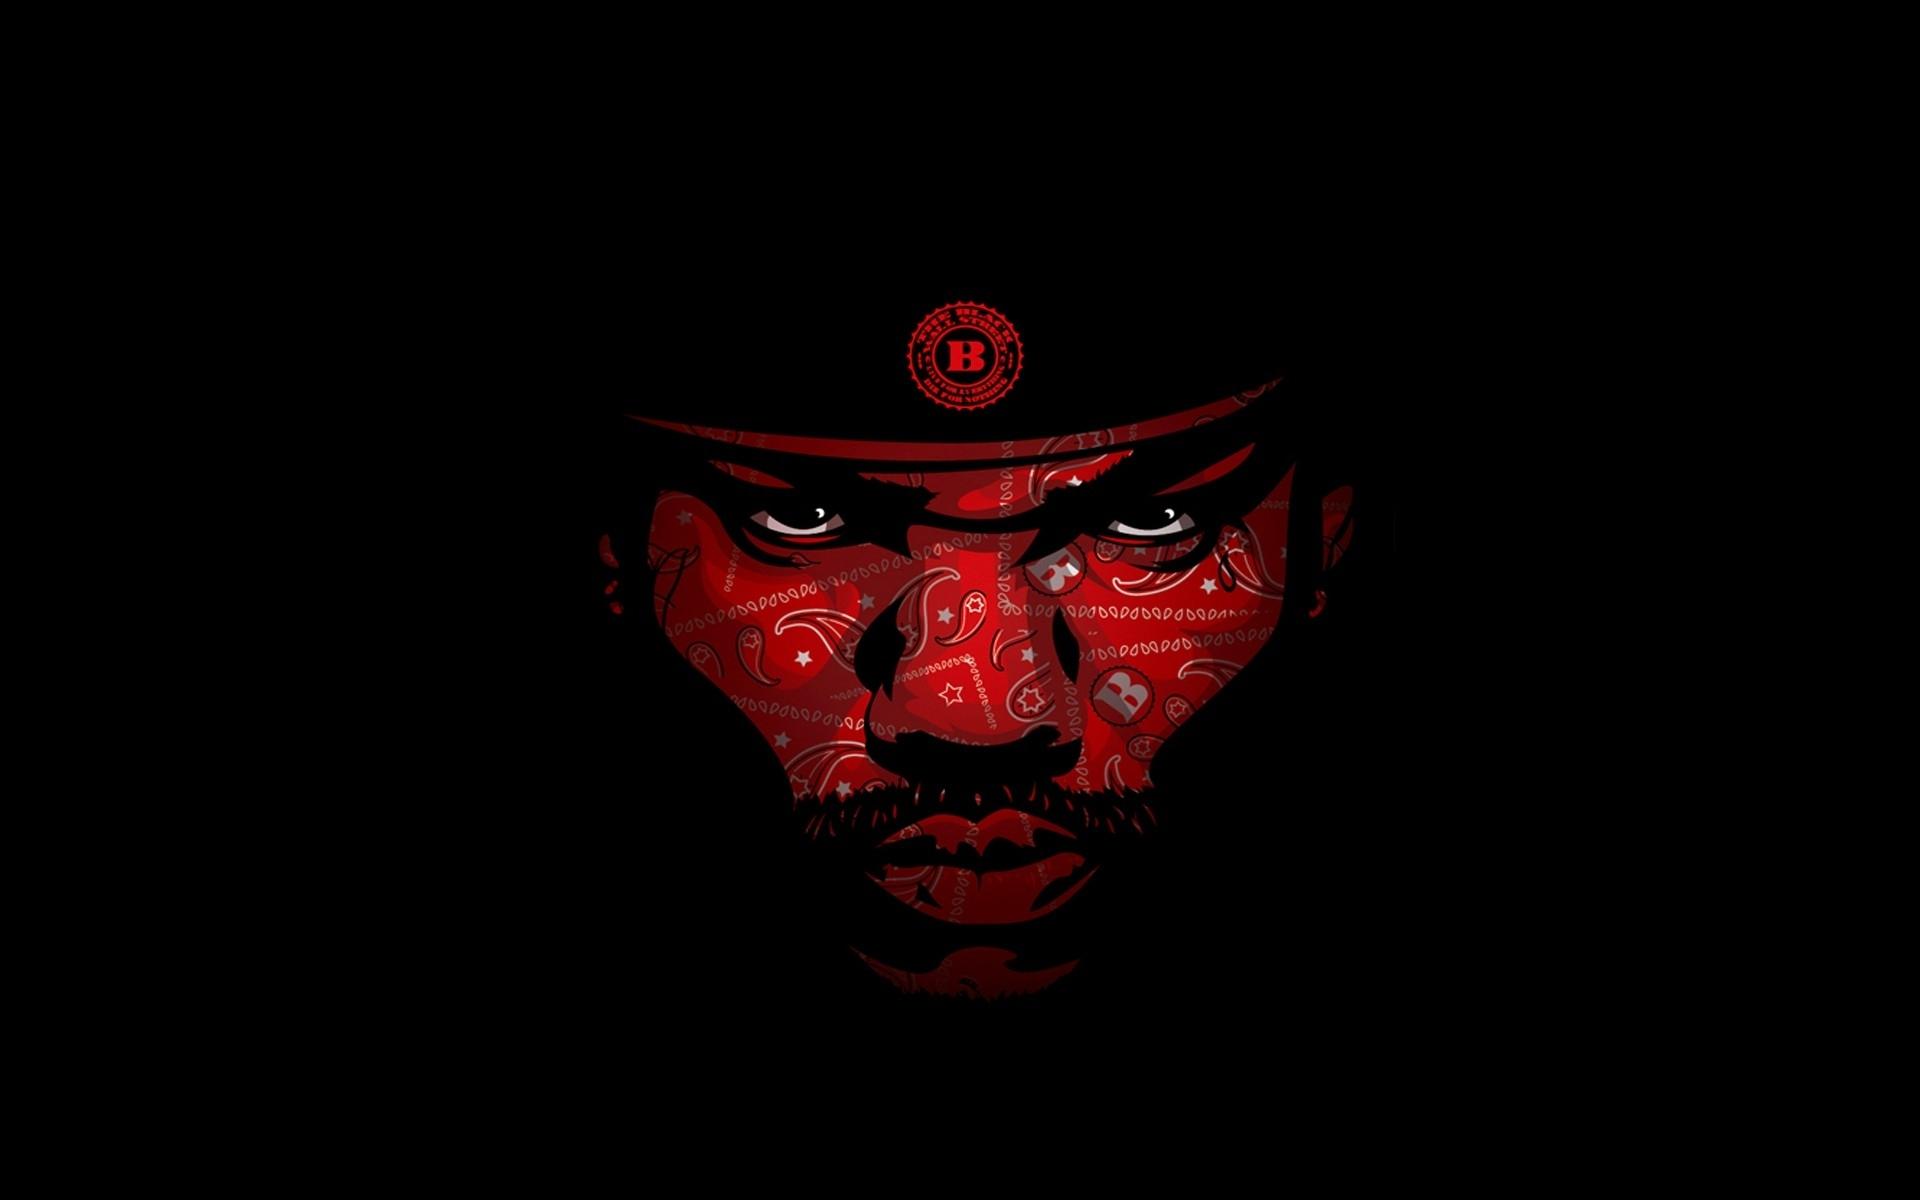 blood the game hip hop rap rapper black background 1920x1200 wallpaper 1920x1200